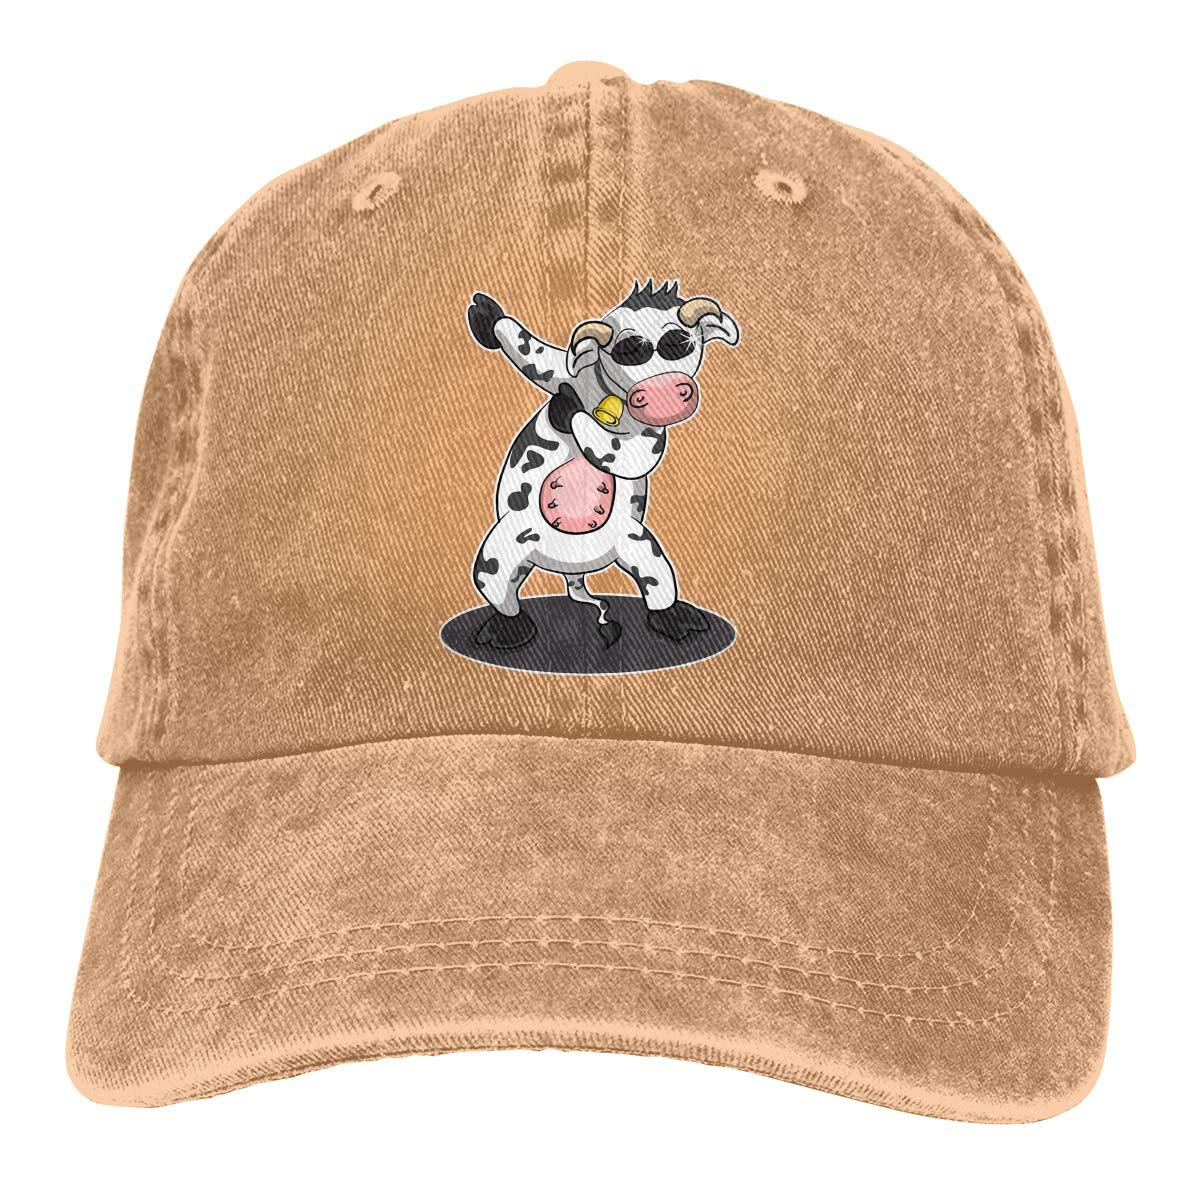 Men Women Dabbing Dancing Cow Funny Vintage Washed Dad Hat Cute Adjustable Baseball Cap